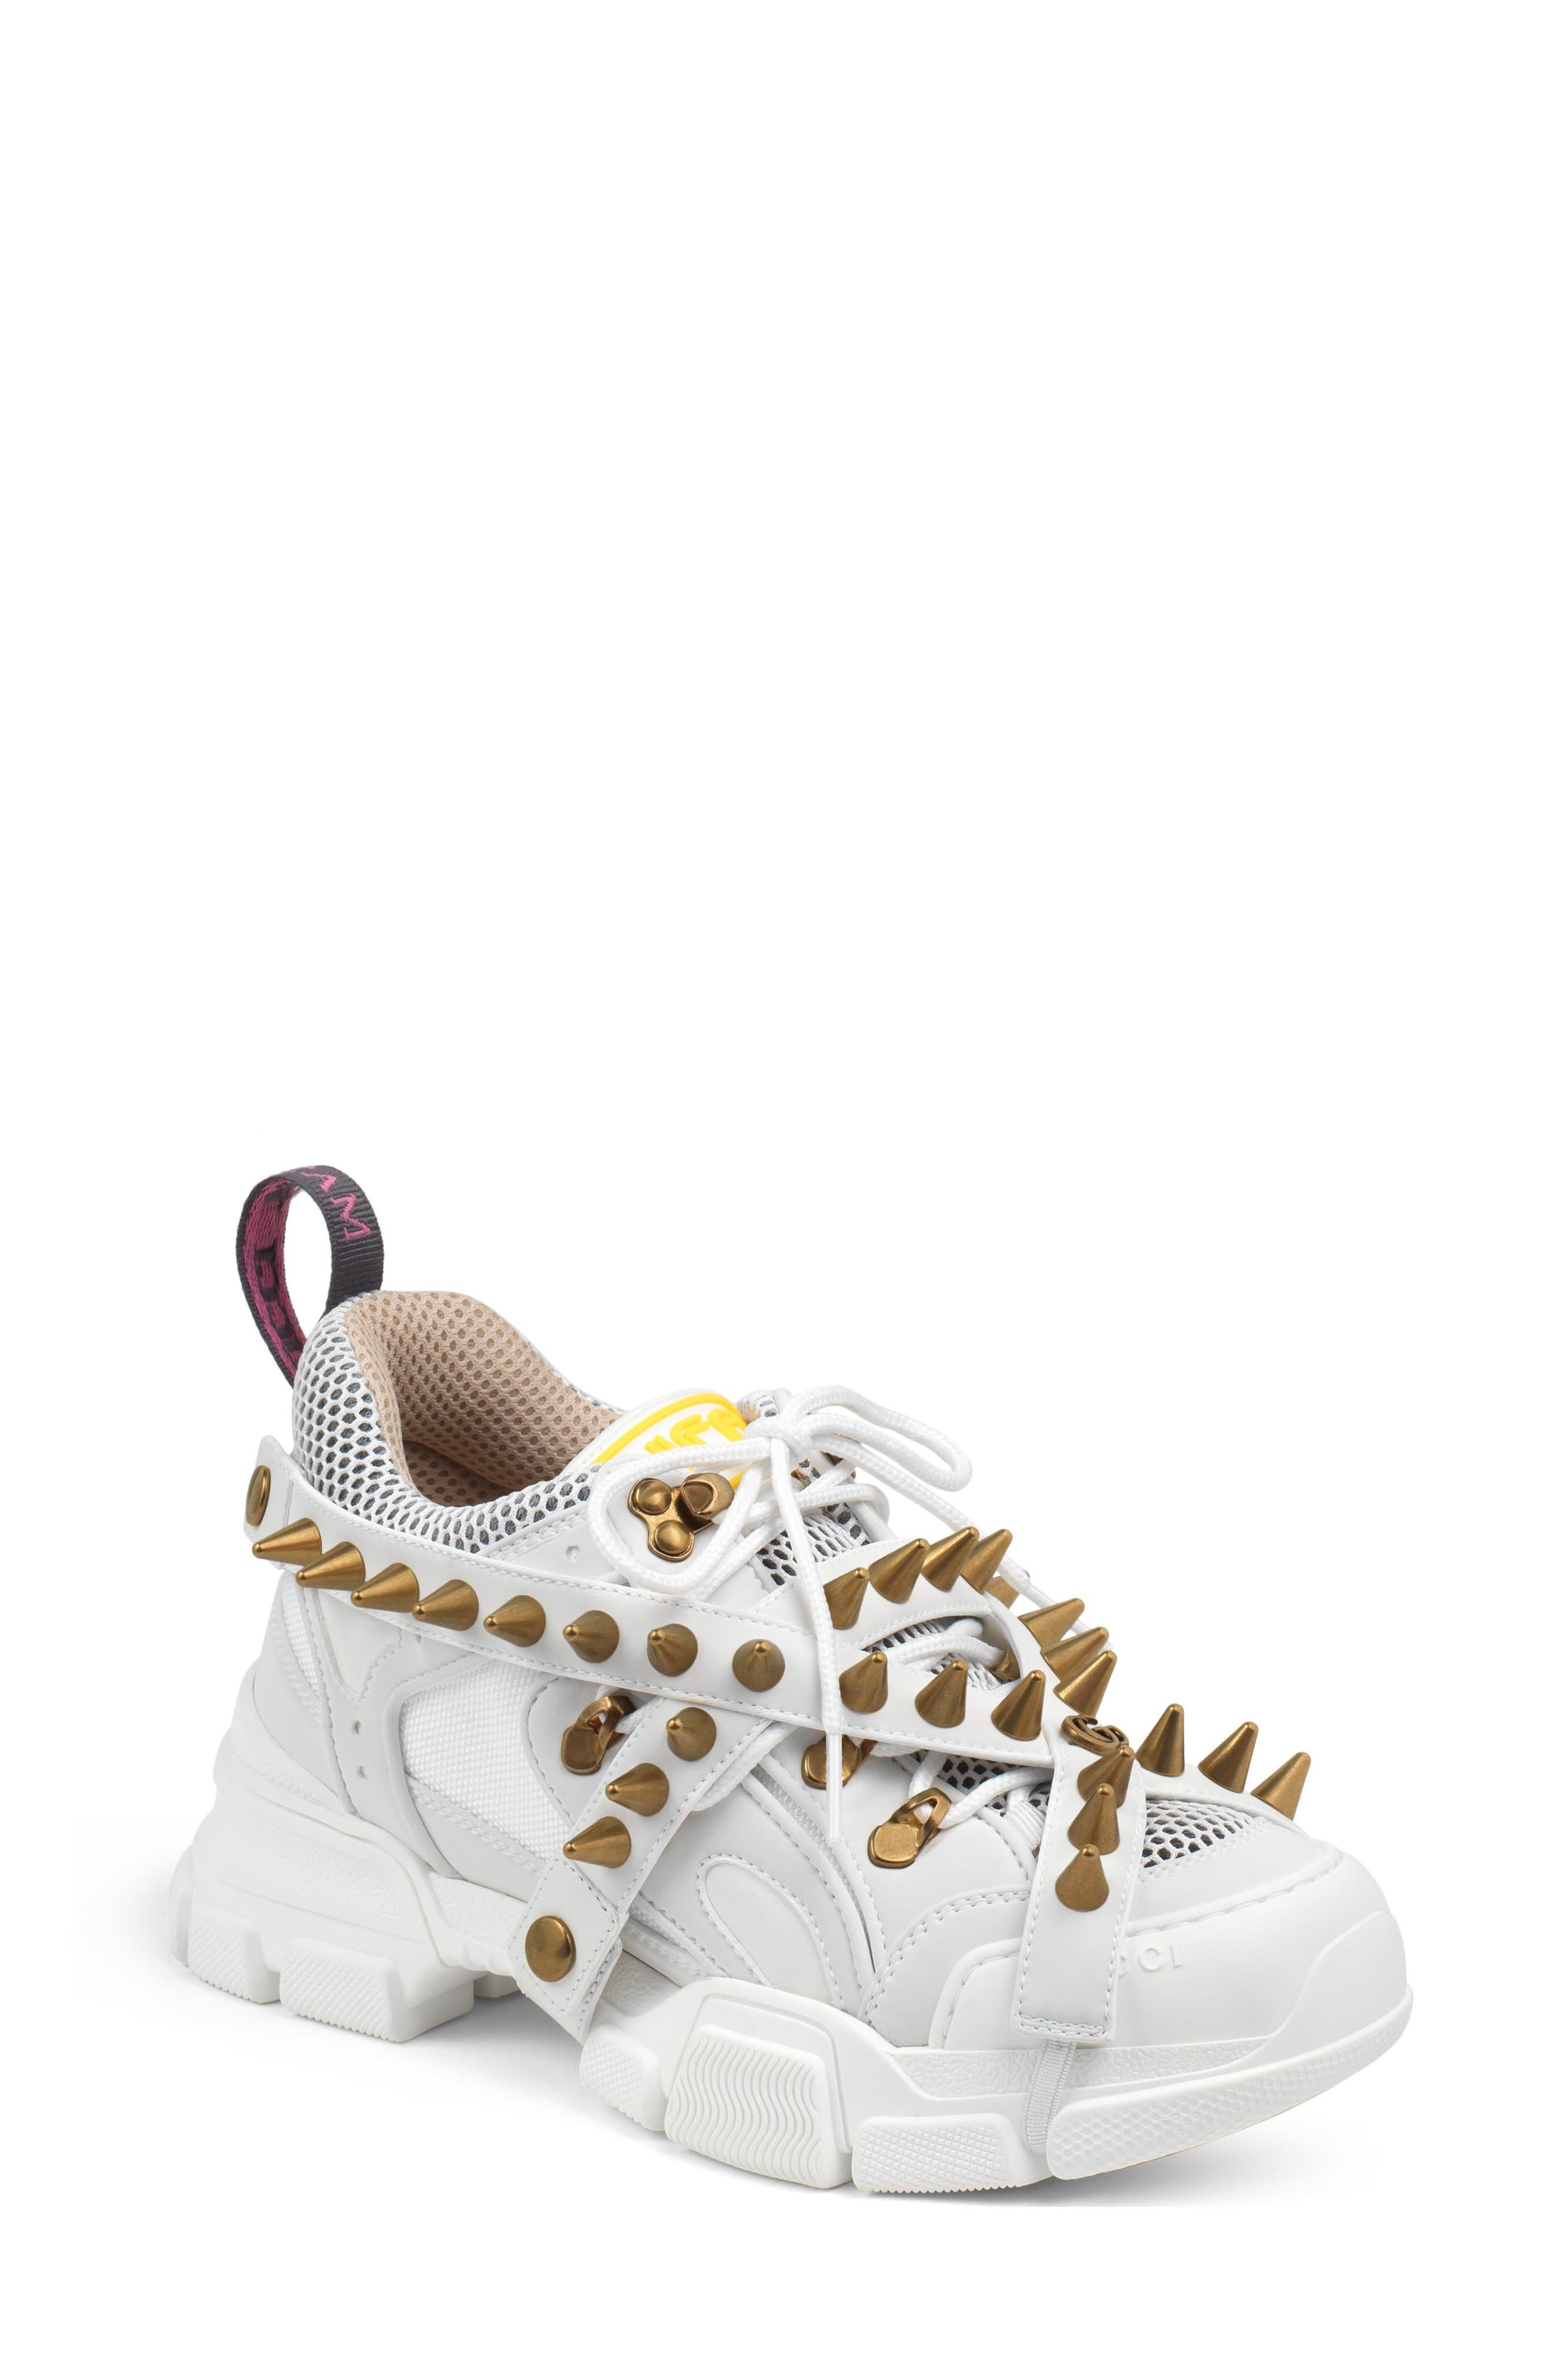 Gucci Flashtrek Spike Sneaker - White